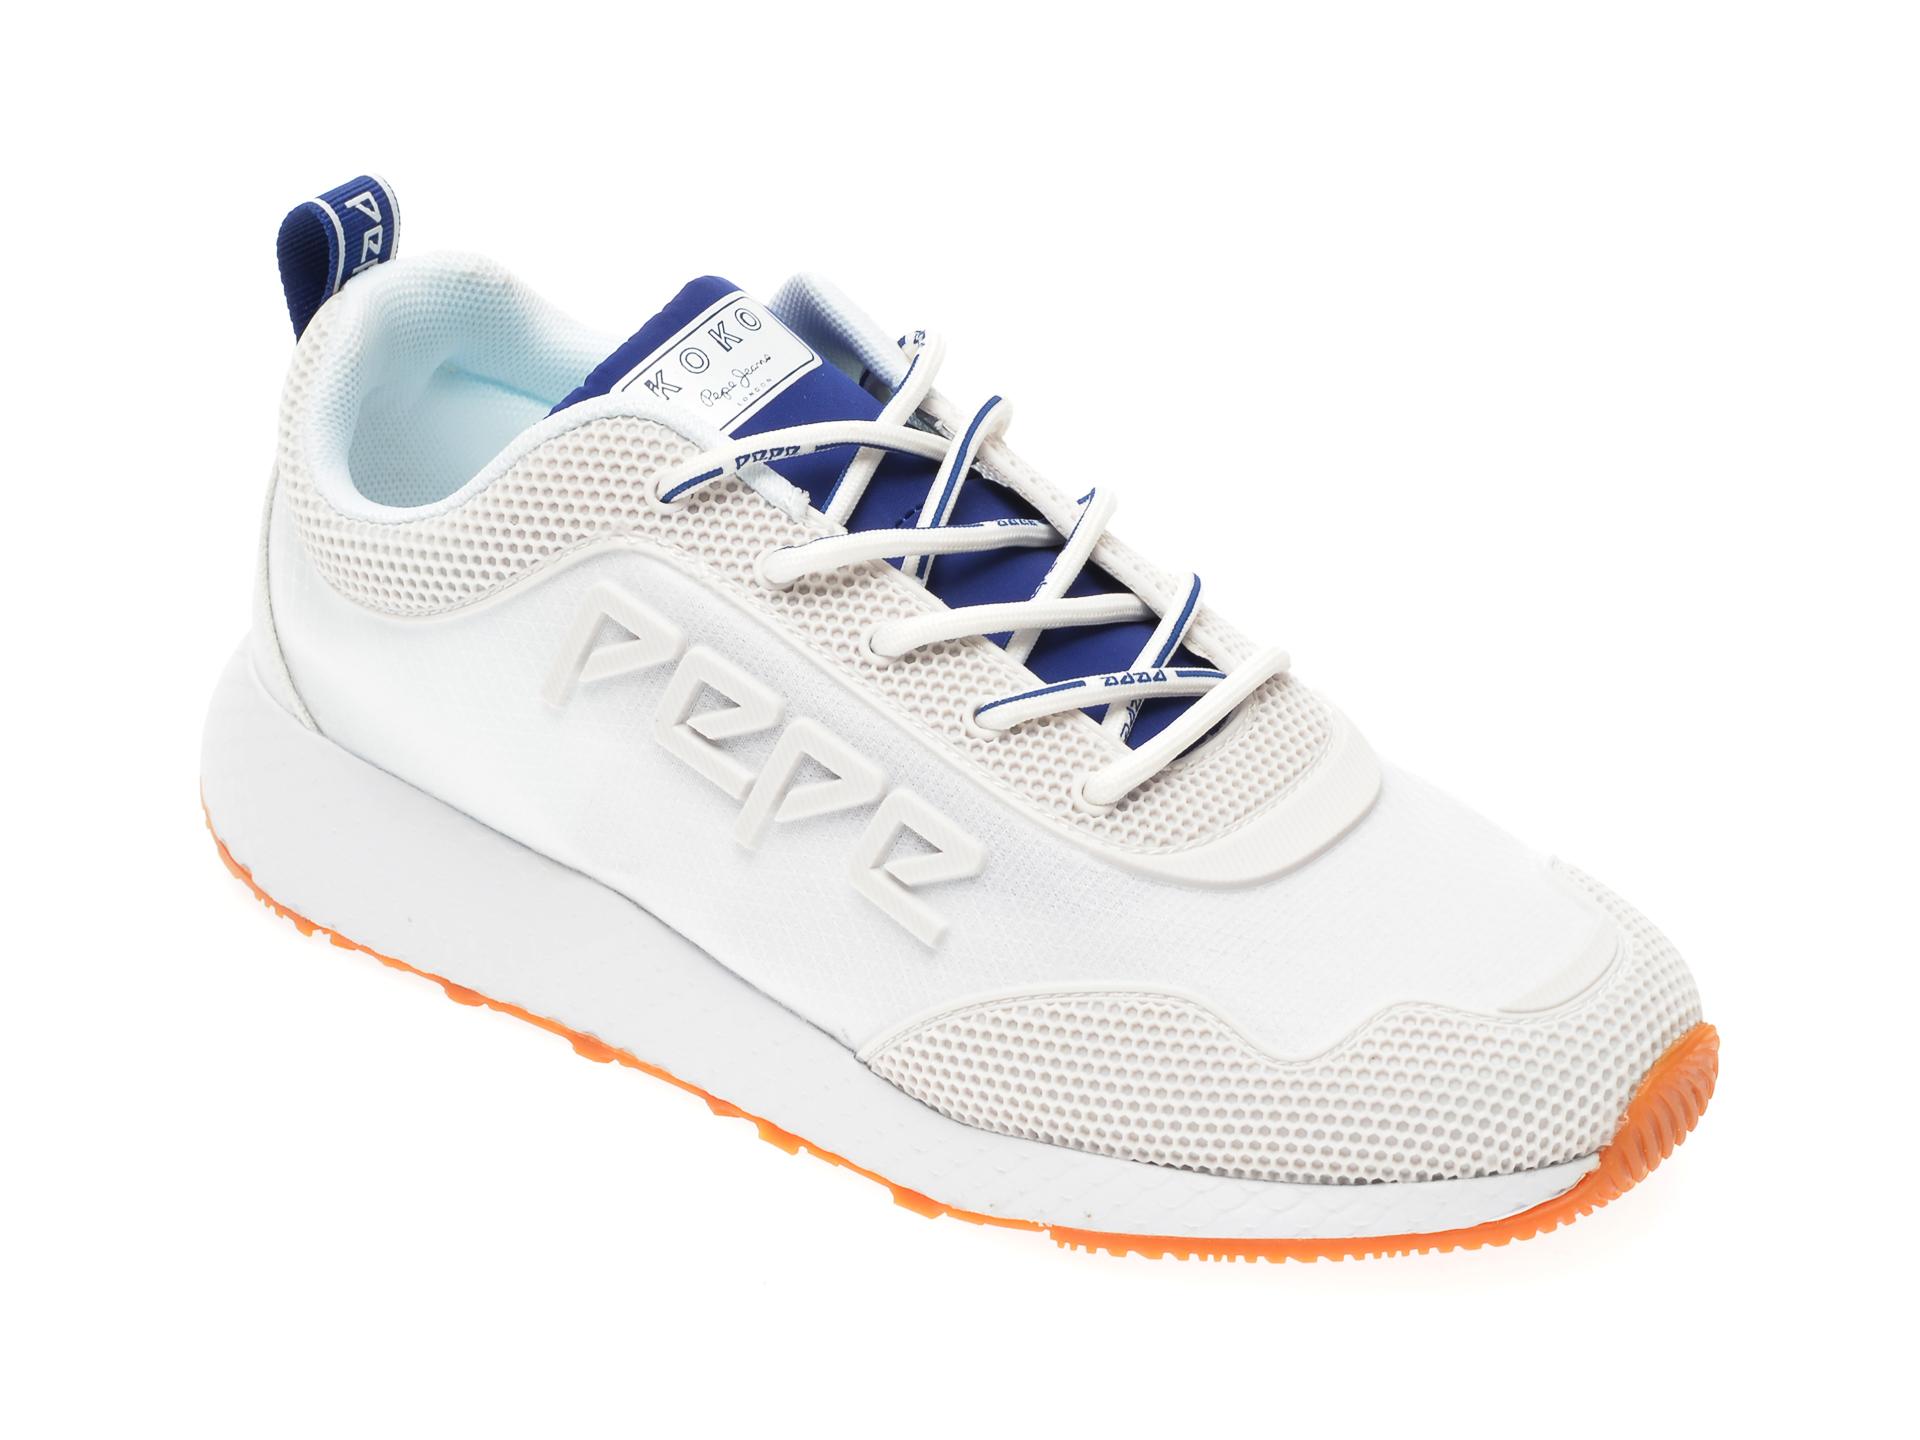 Pantofi sport PEPE JEANS albi, LS30998, din material textil si piele ecologica